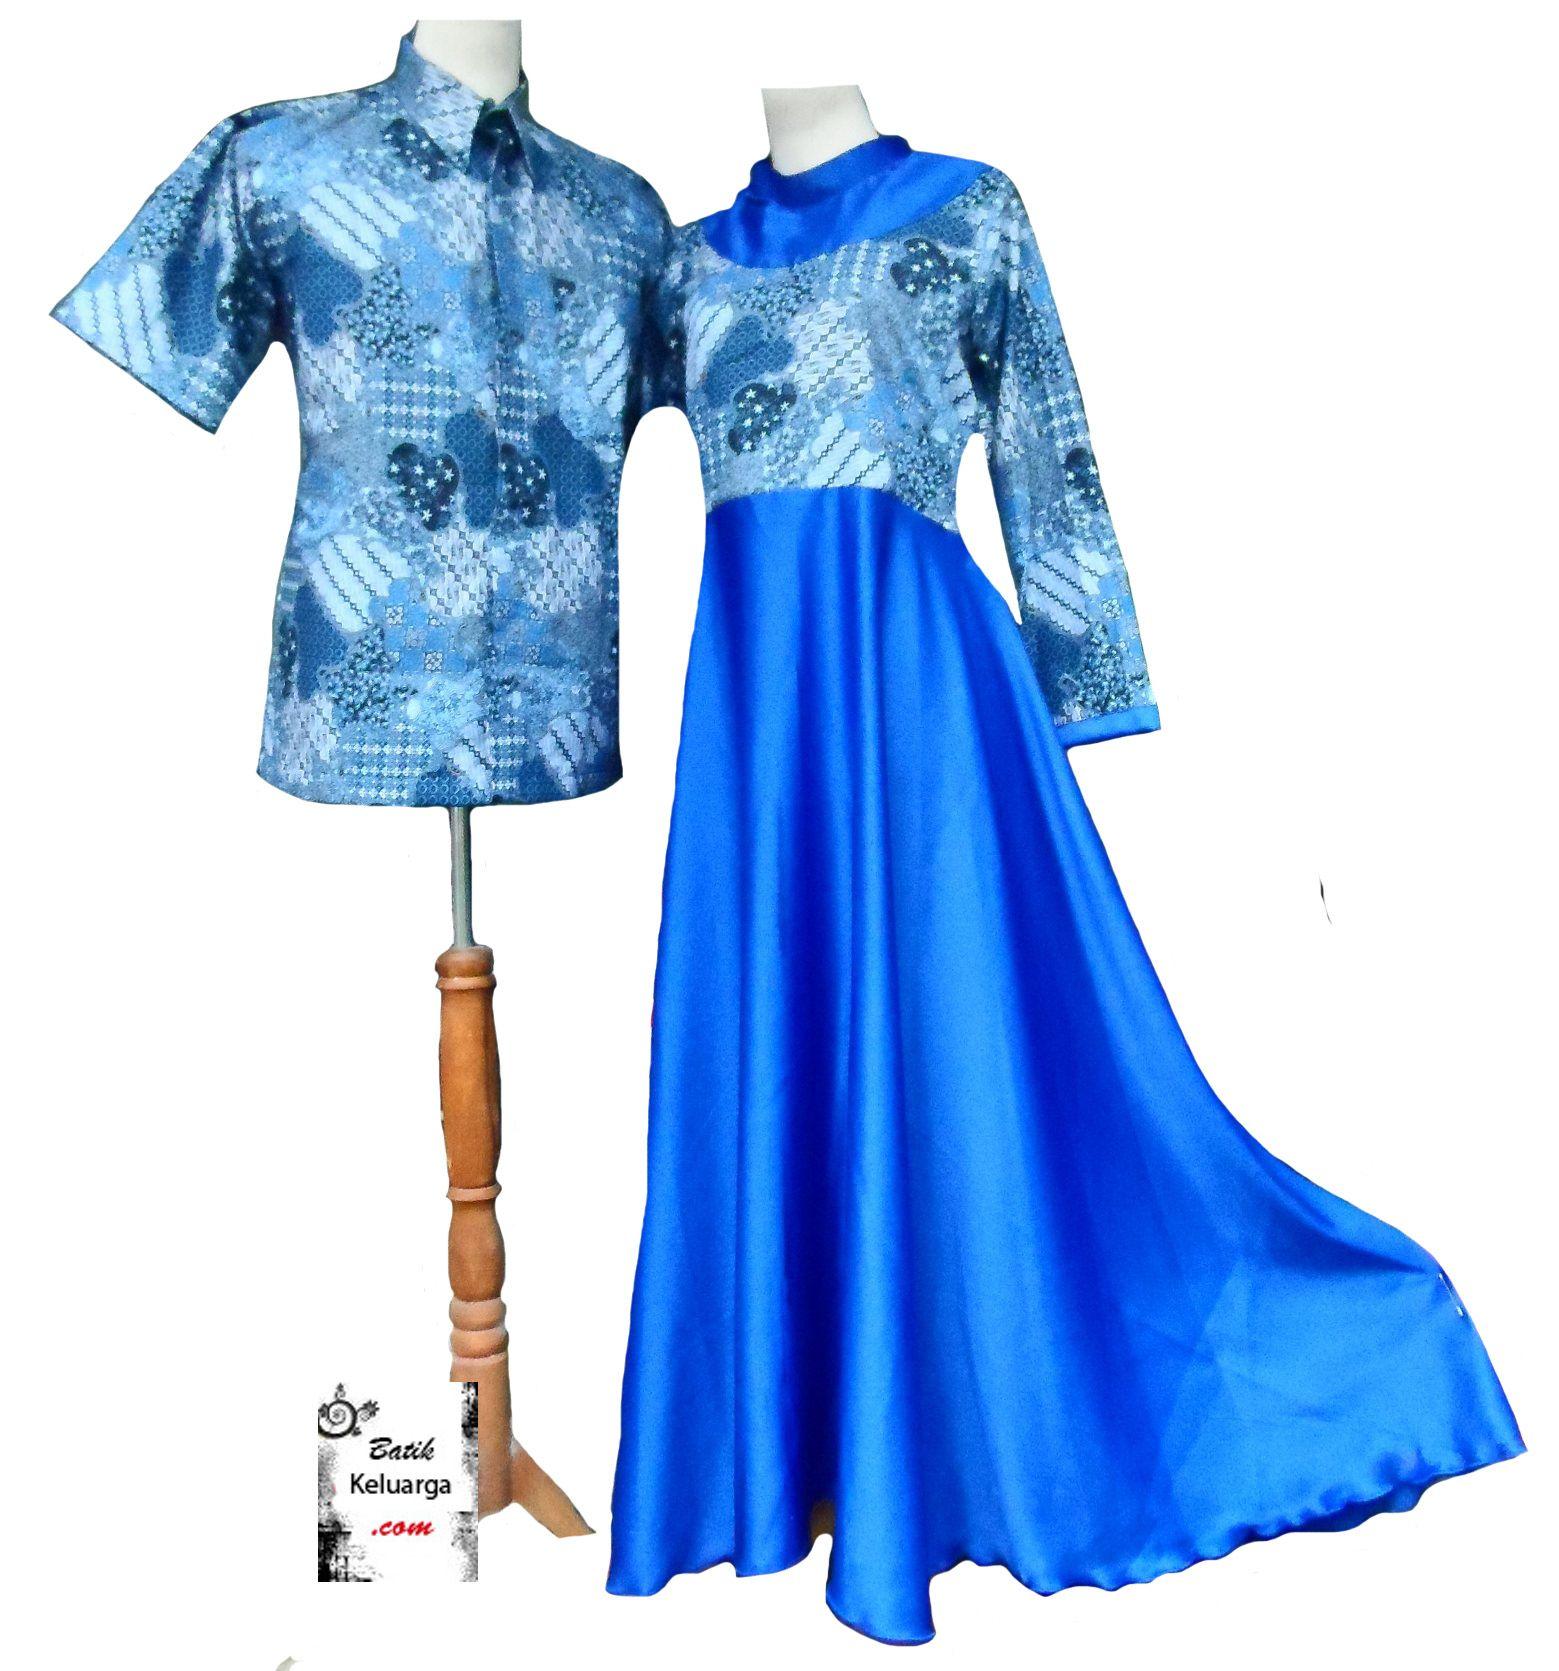 Baju Pesta Hijau Lembut Batik Keluarga Pinterest Blog